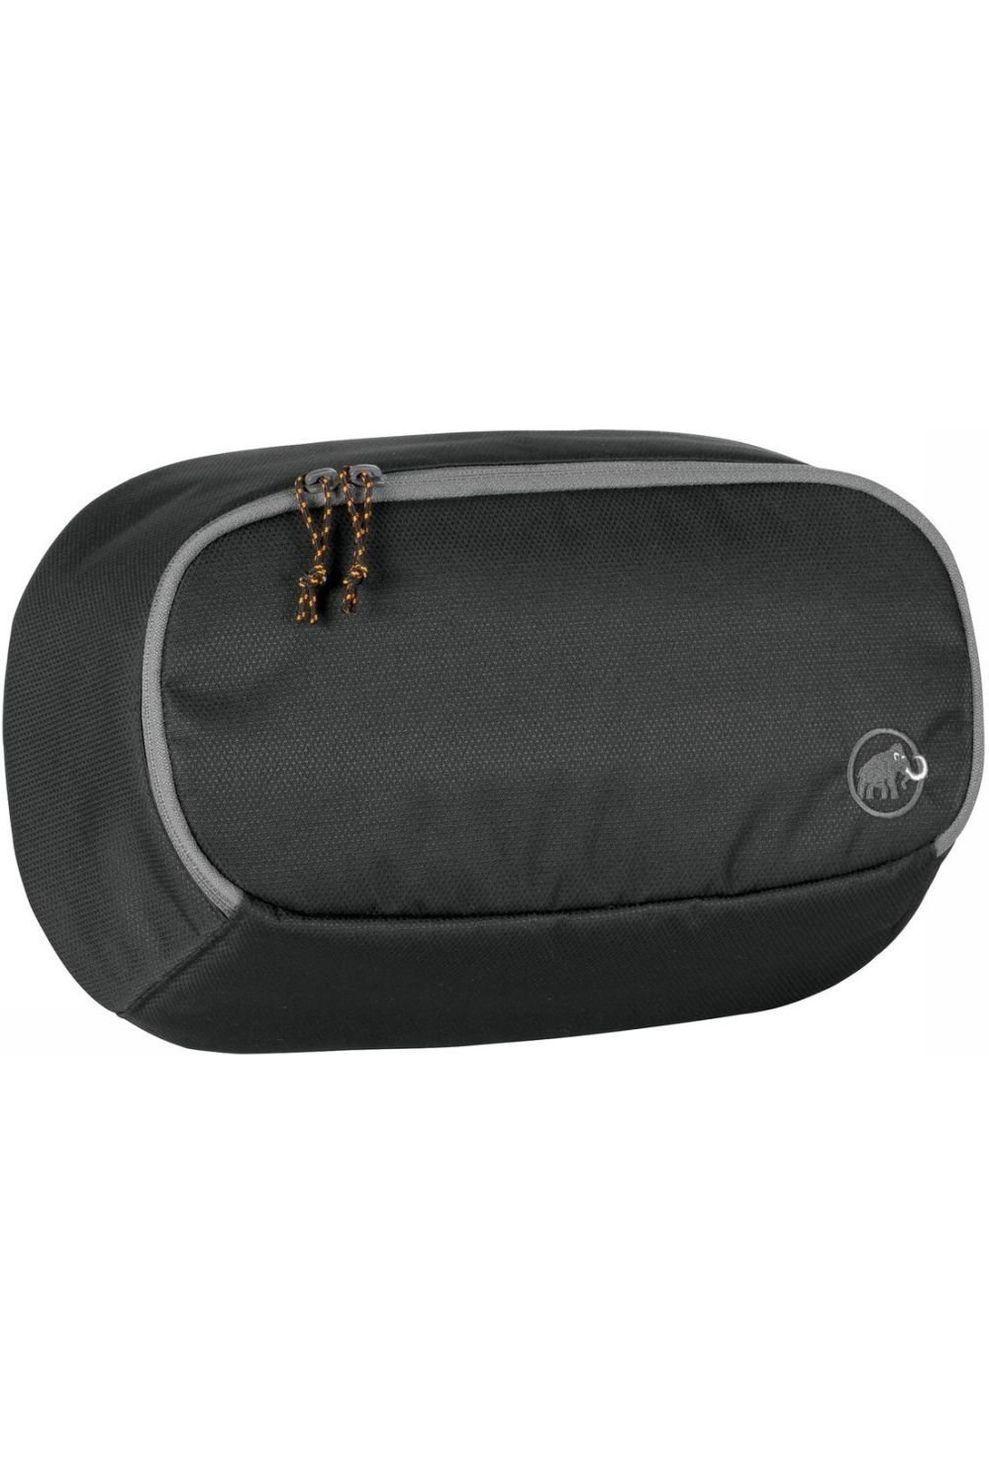 Mammut Rugzak Accessoire Add-On Pocket - Zwart